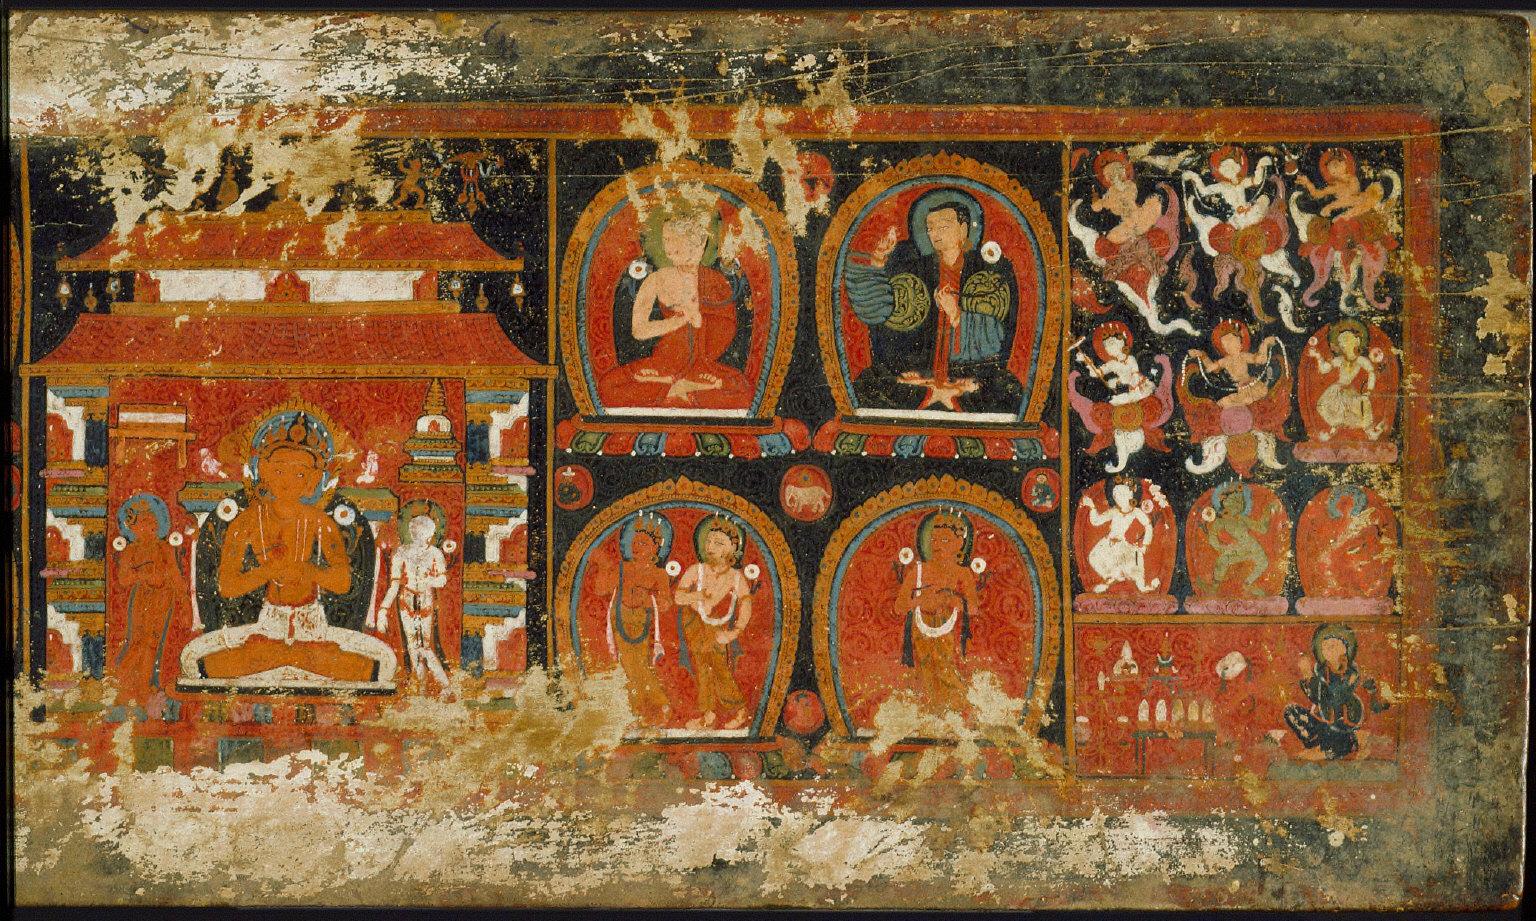 Enshrined Manjusri with Monks and Deities, Cover of a Prajnaparamita (The Perfection of Wisdom)